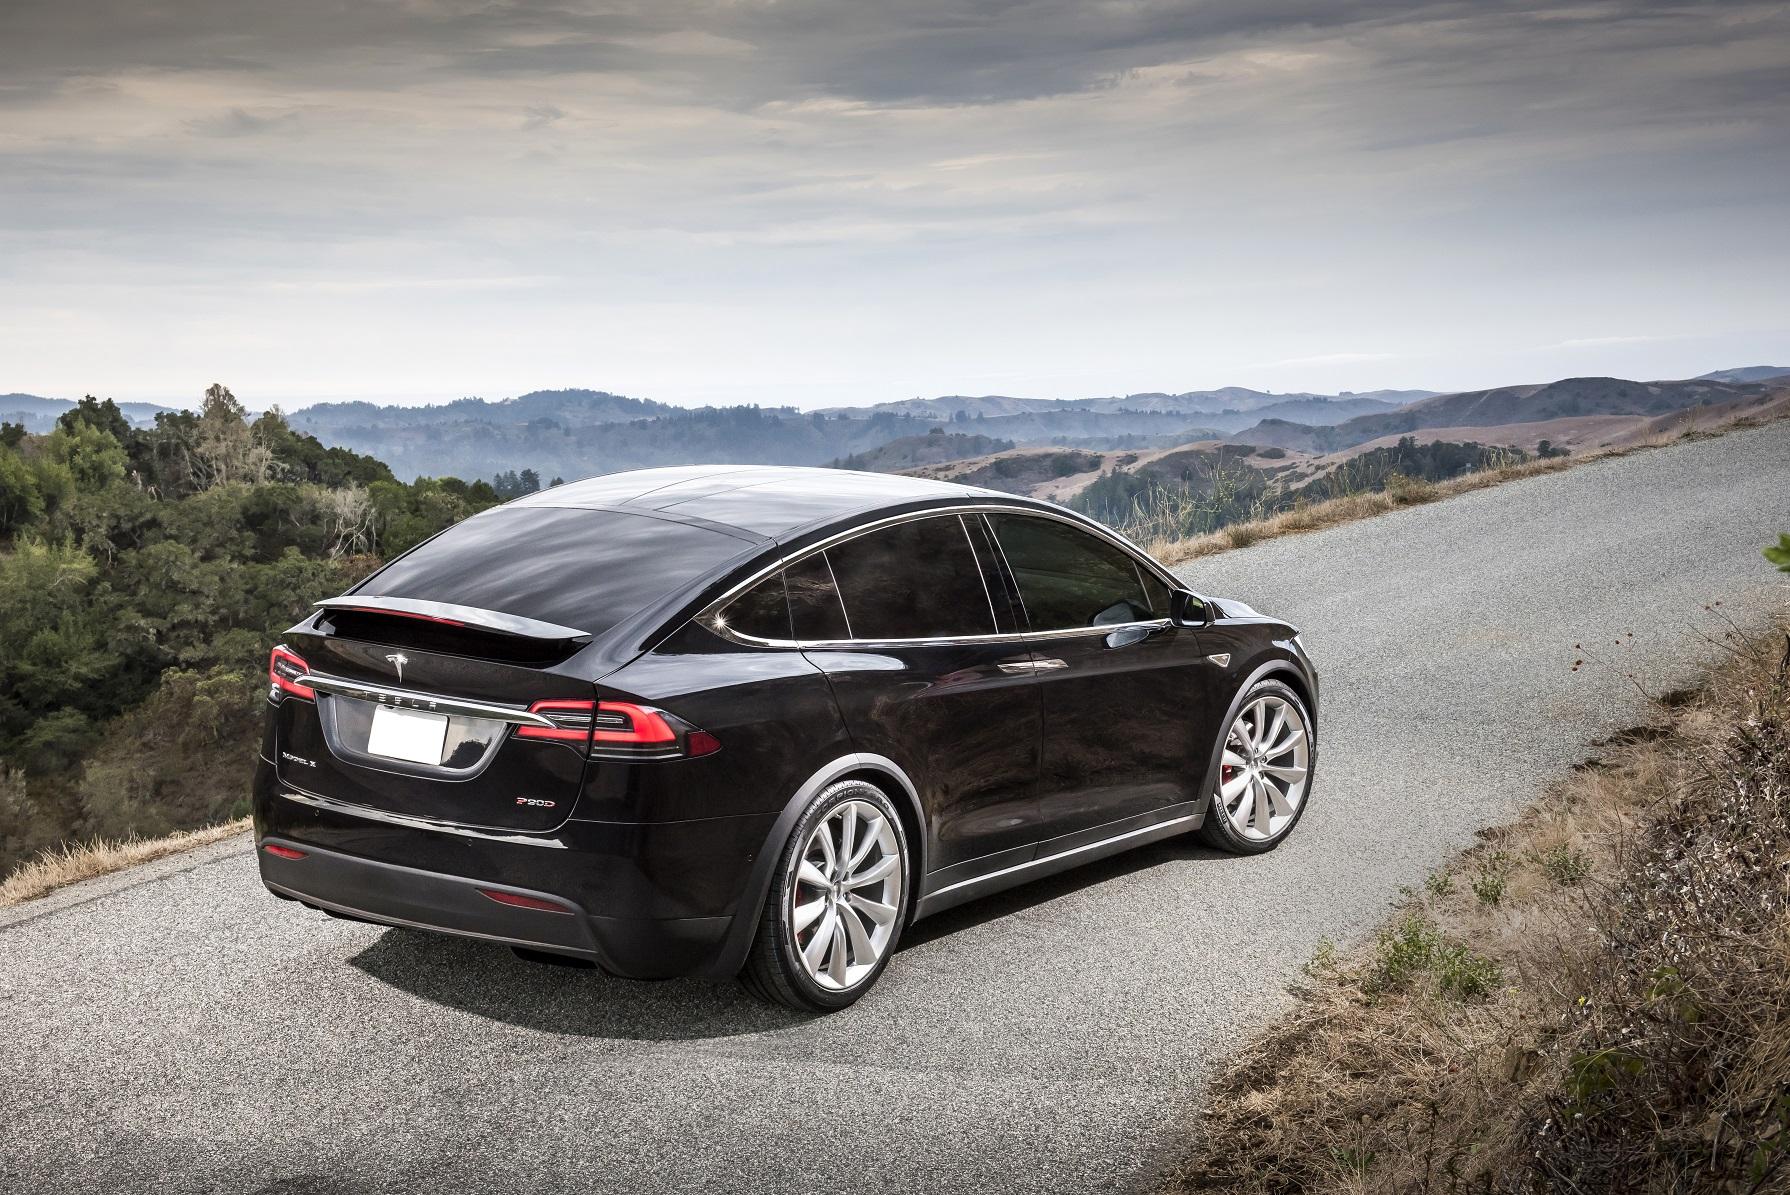 Tesla bekrefter: Autopilot var aktivert i dødskrasj